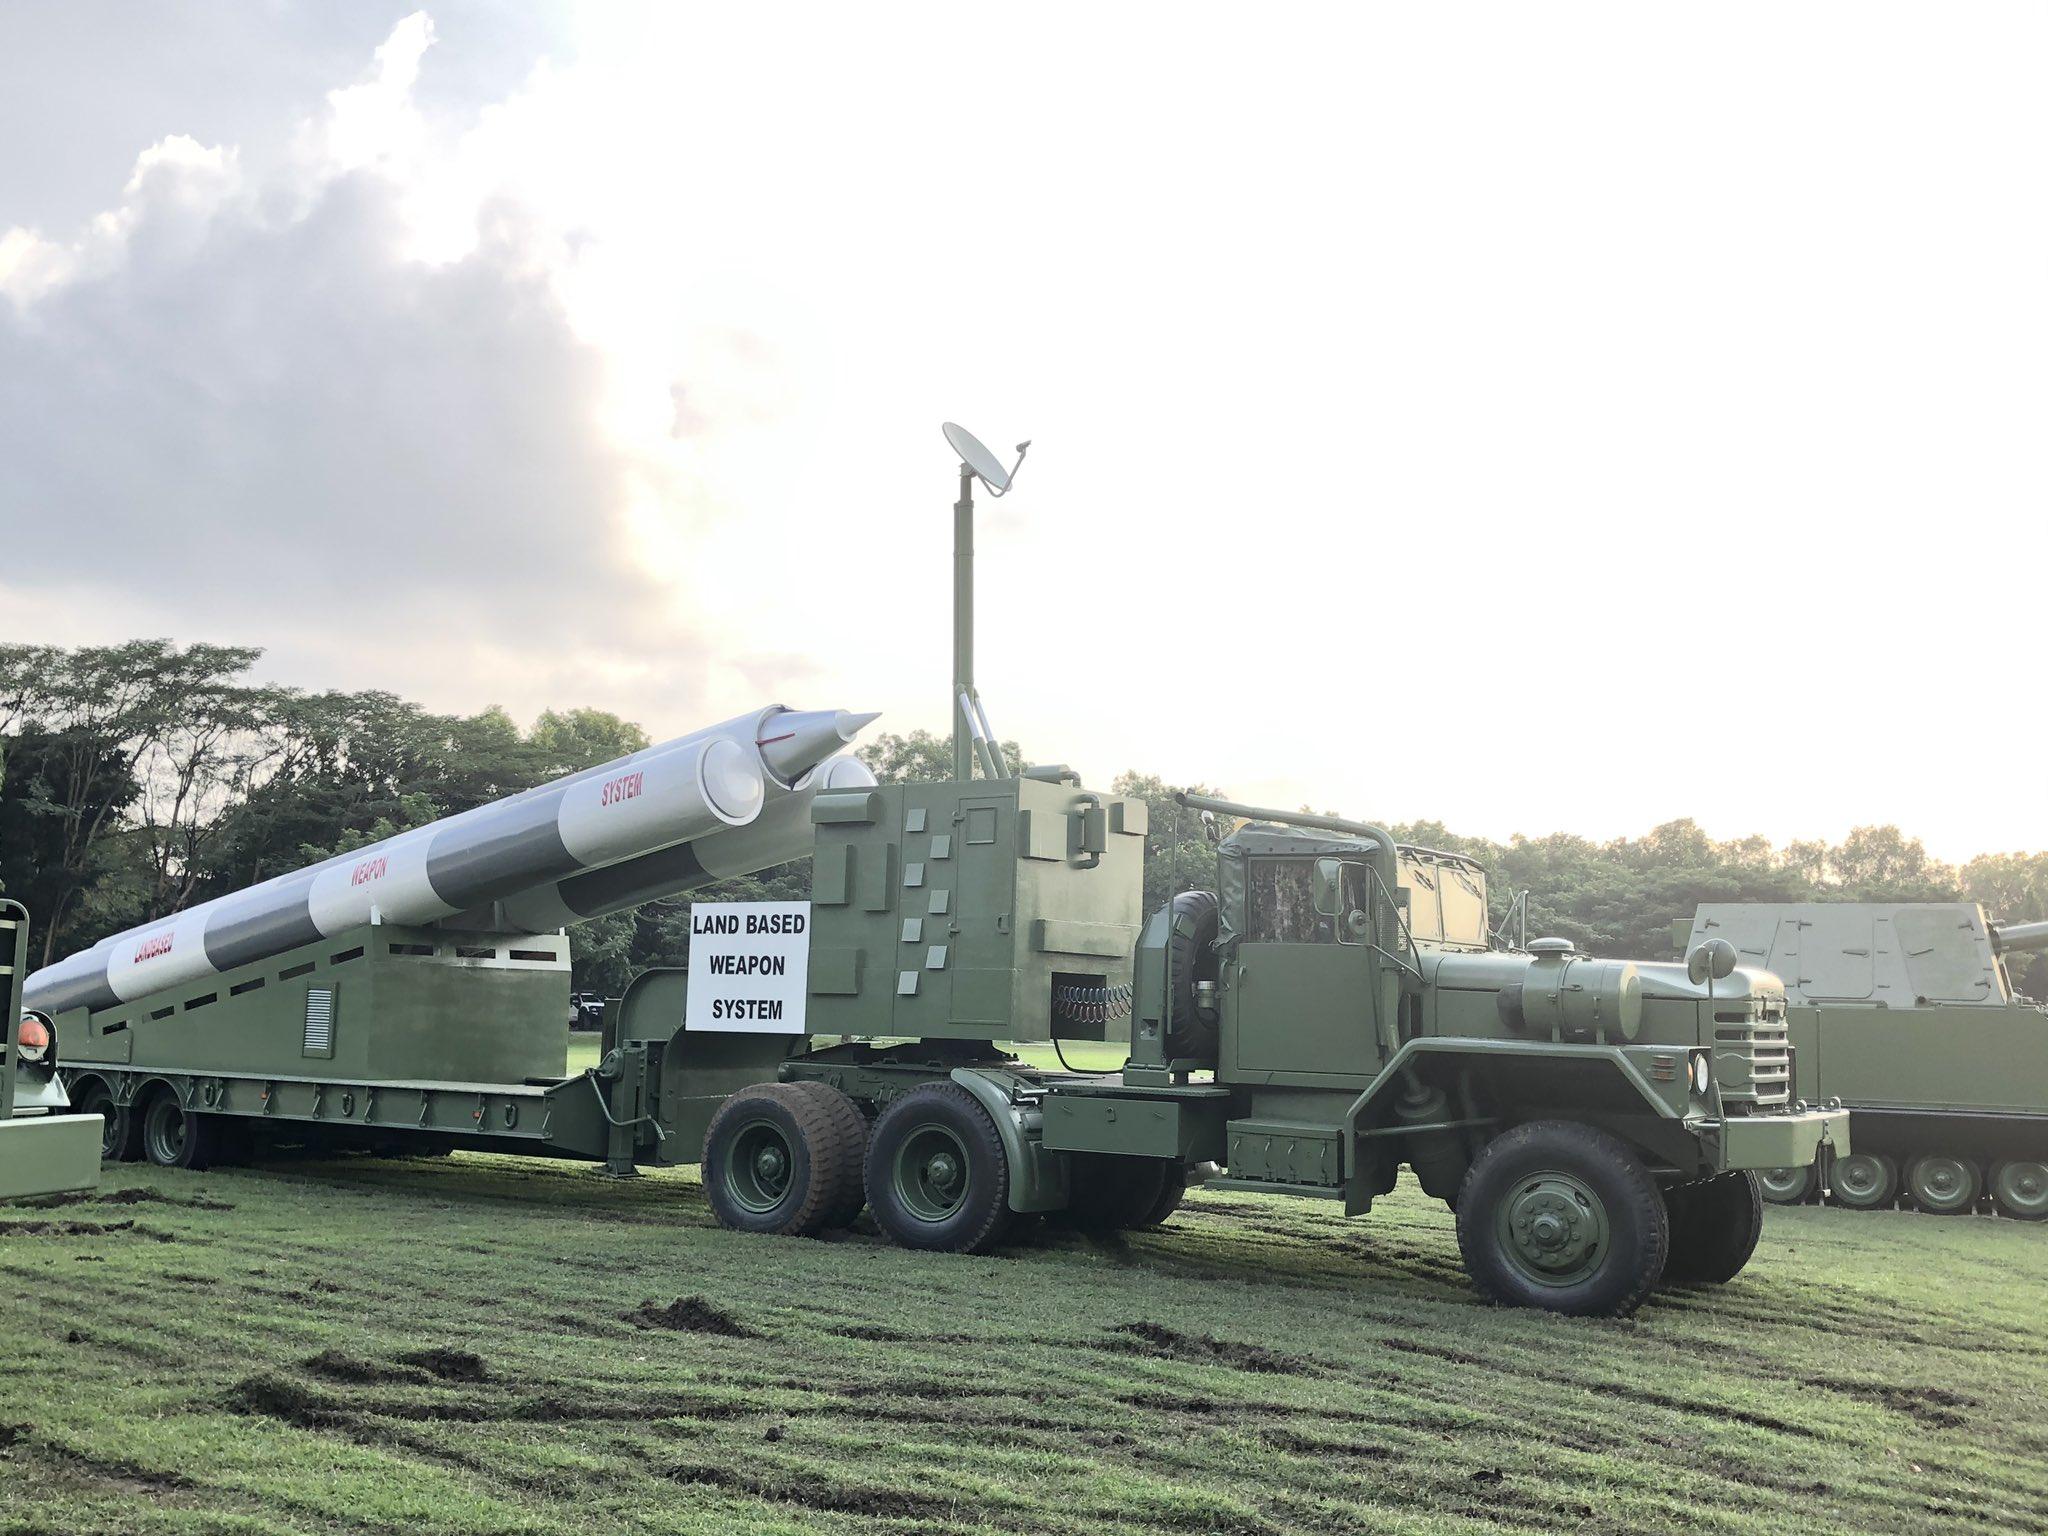 Philippines land-based platform for Brahmos missile